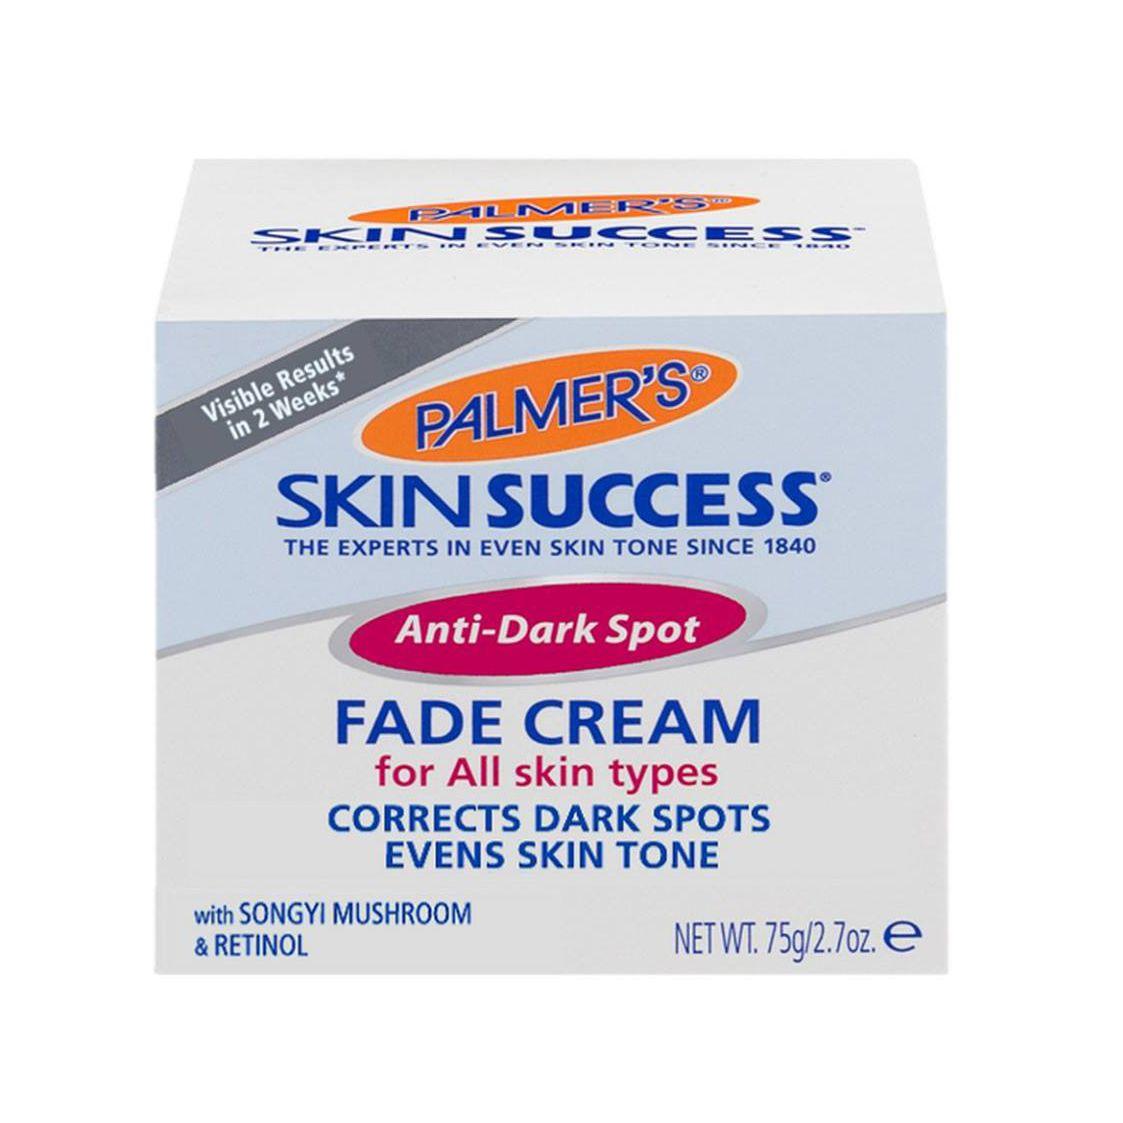 Palmer's Skin Success Eventone Fade Cream Anti-Dark Spot 75g